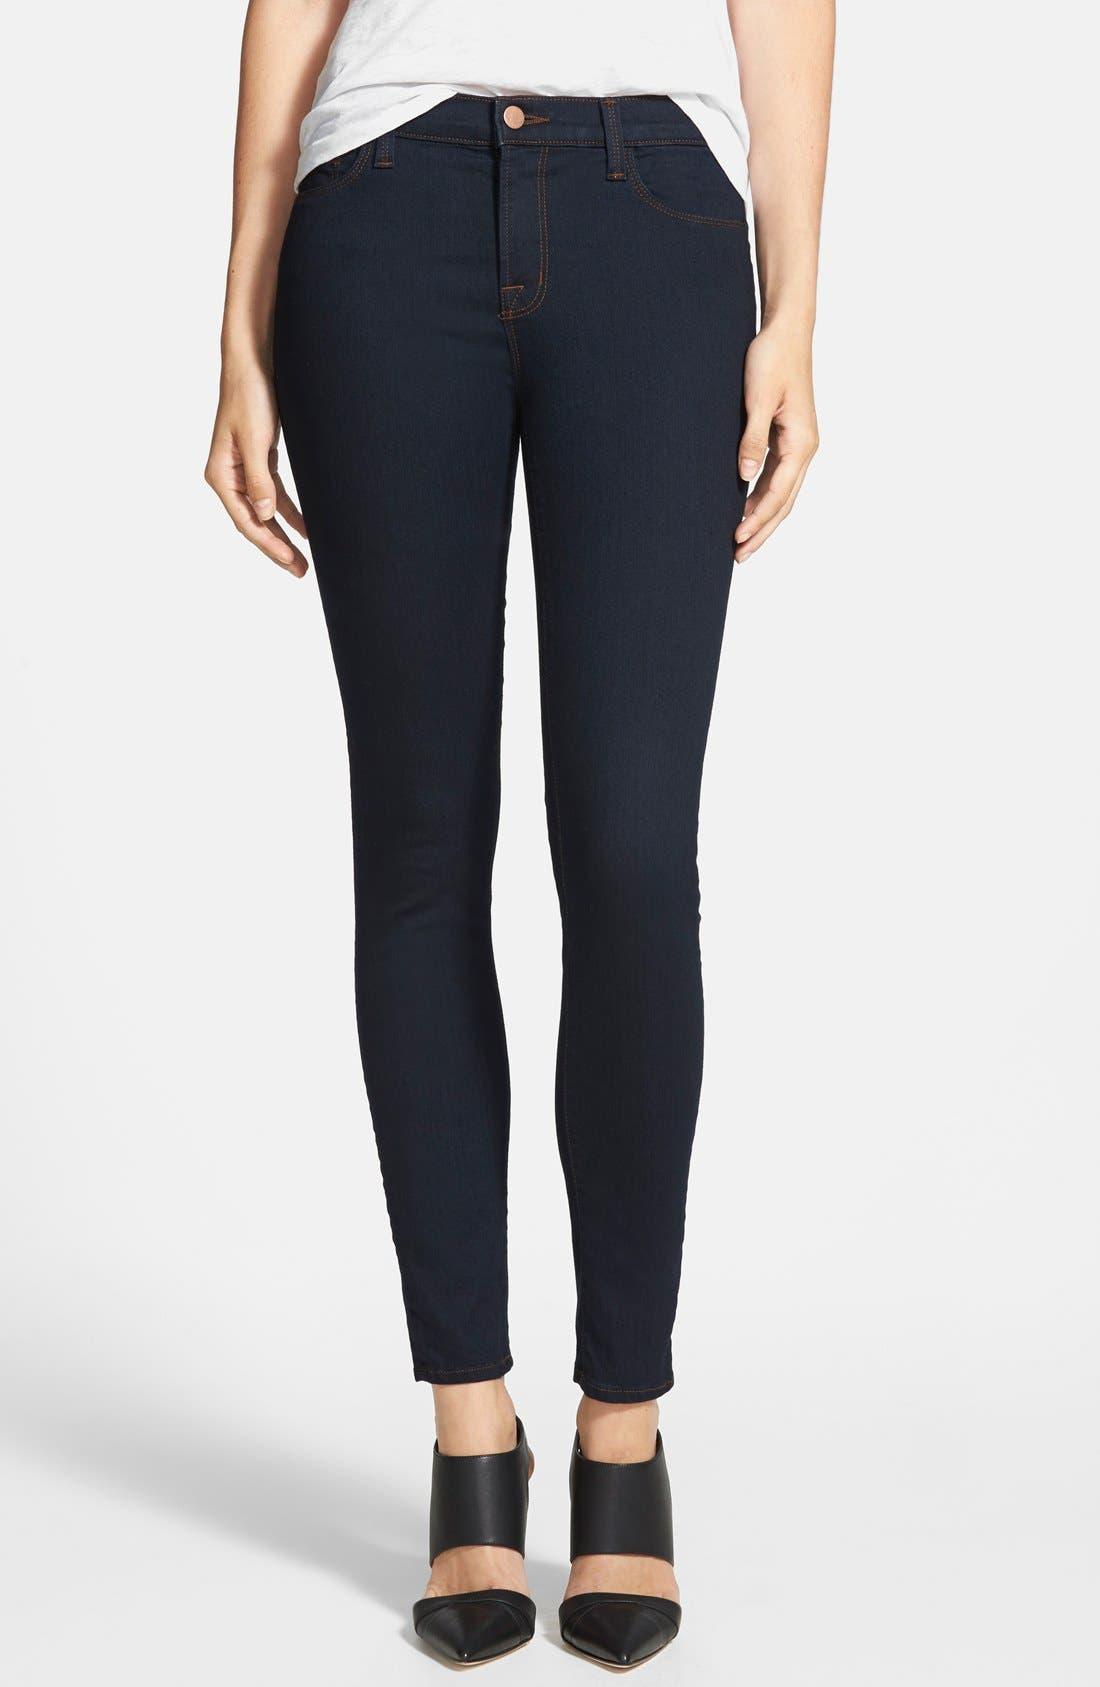 J Brand '811' Ankle Skinny Jeans (Ink) | Nordstrom